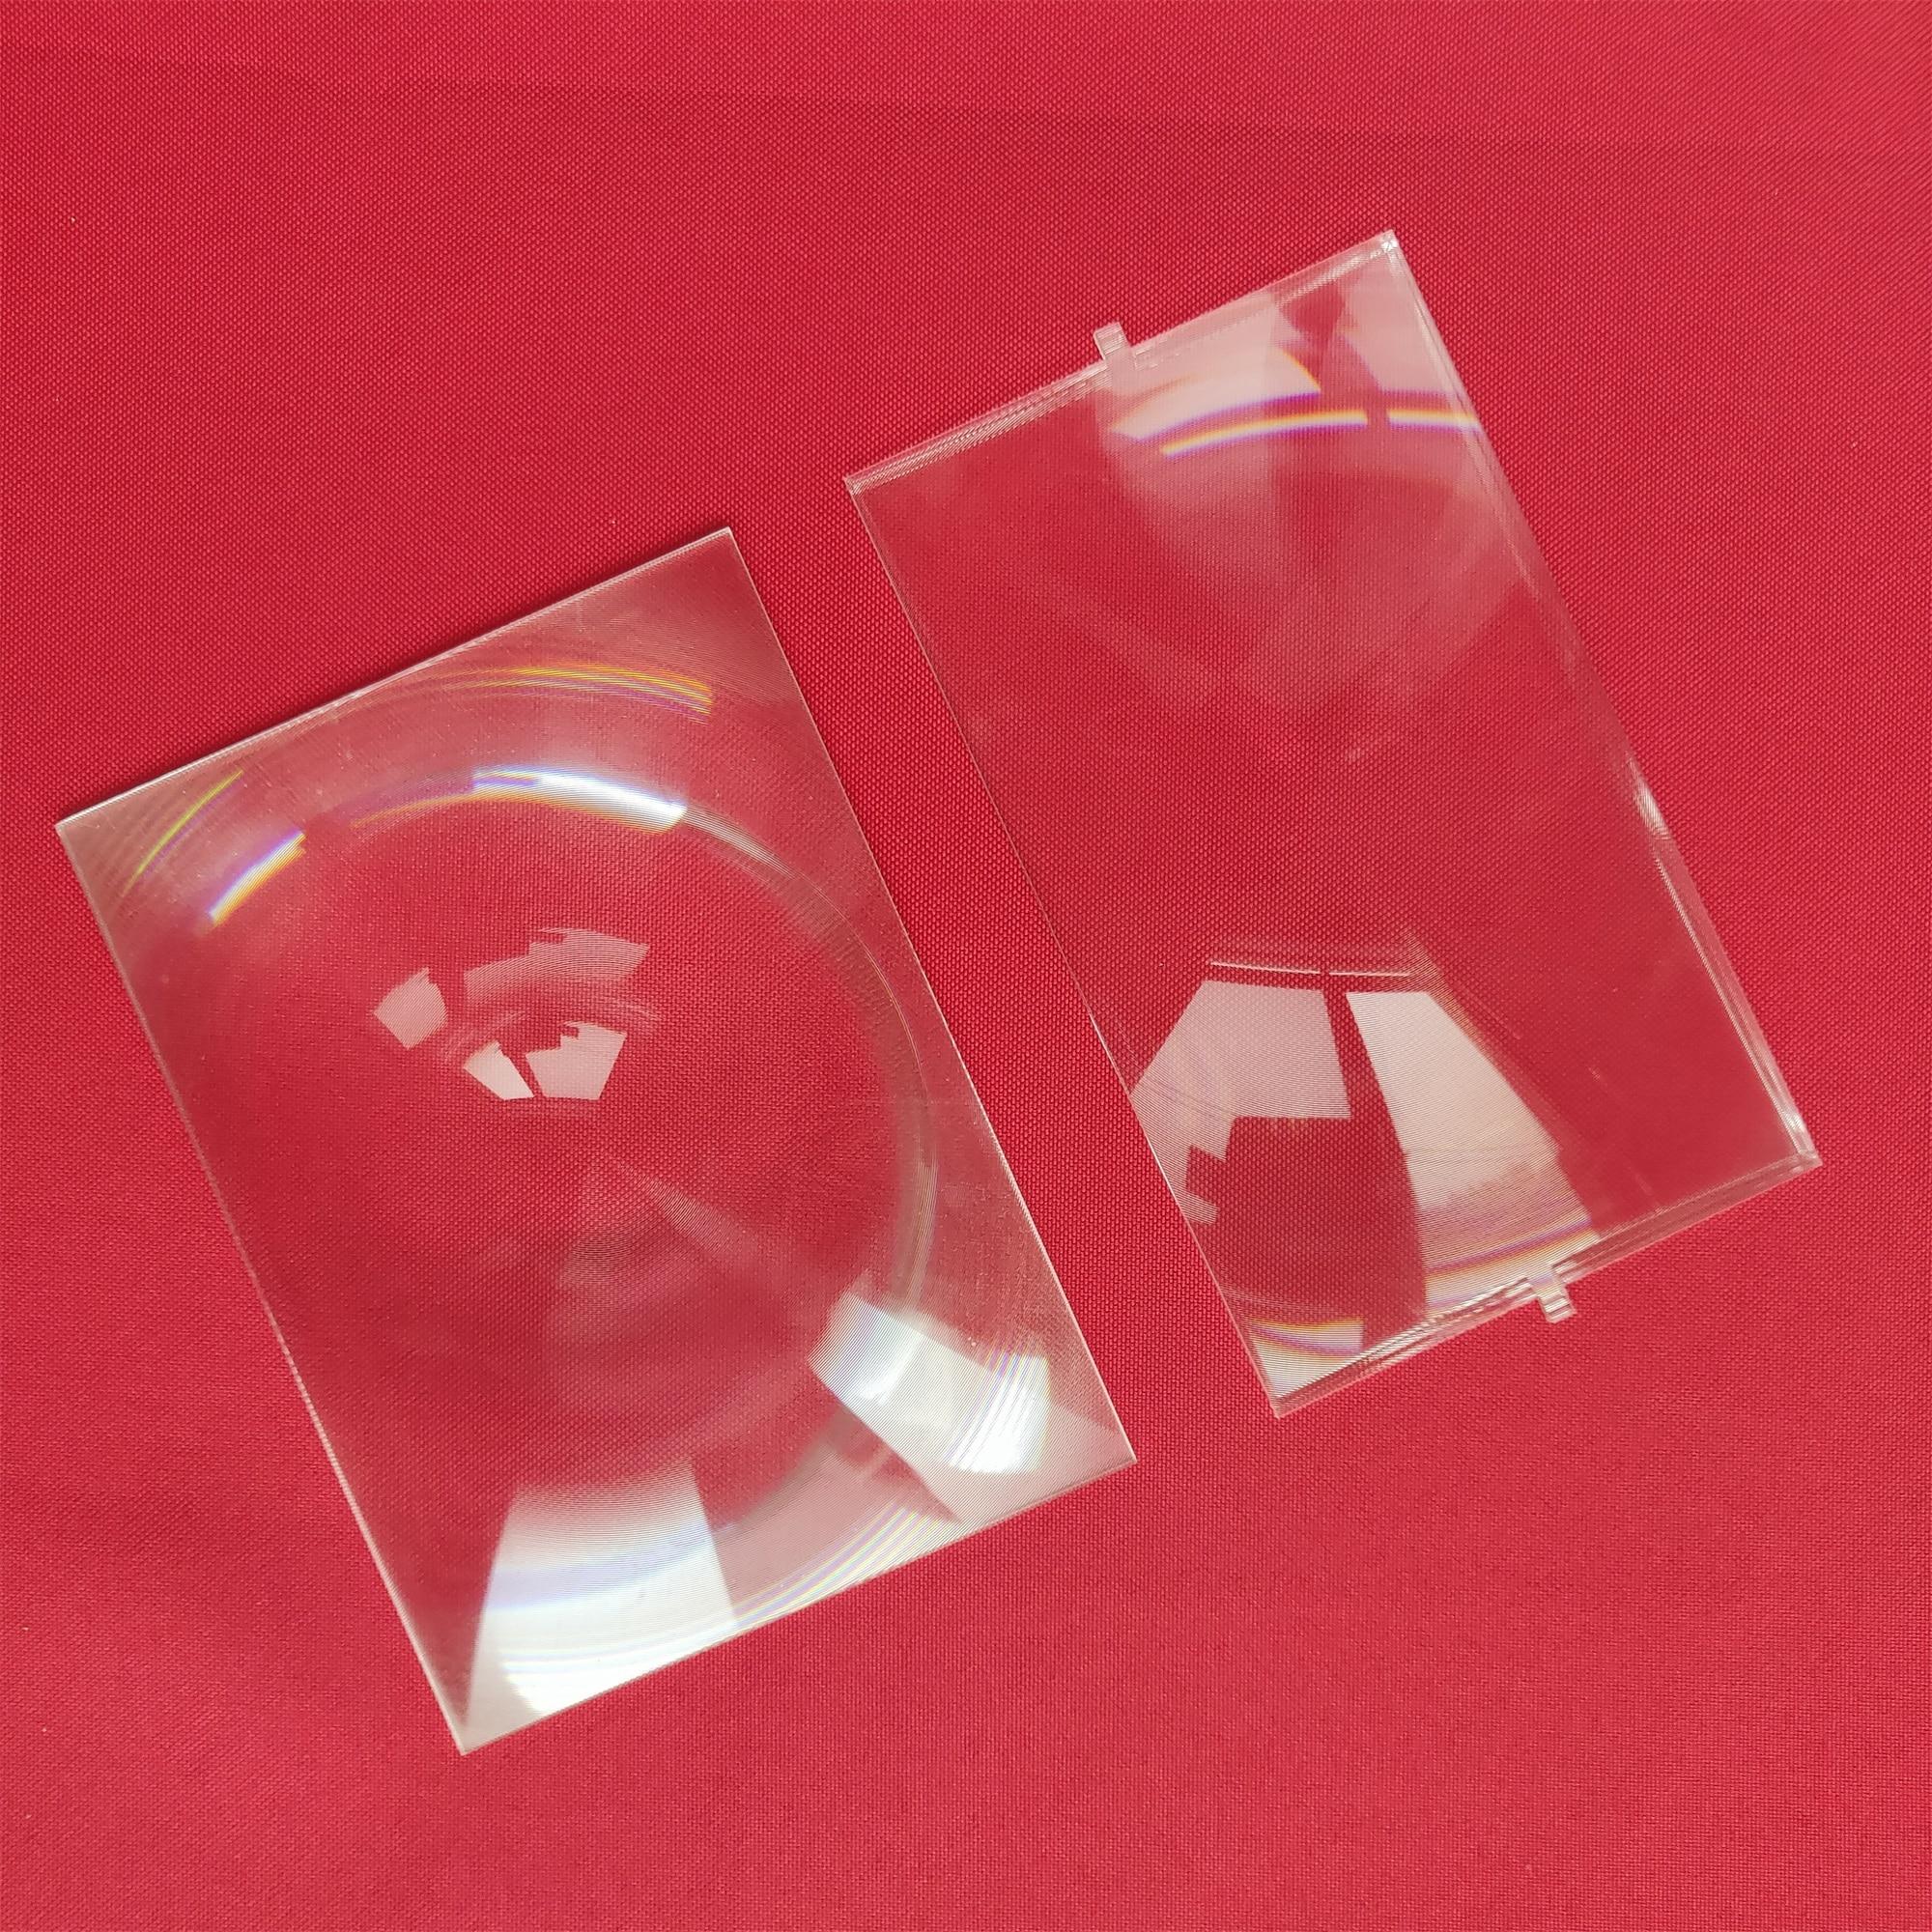 2 pcs Fresnel Lens for 5 5 inch LCD front 148mm 82mm F185mm and back 138mm 100mm F100mm DIY projector beamer fresnel lens kit